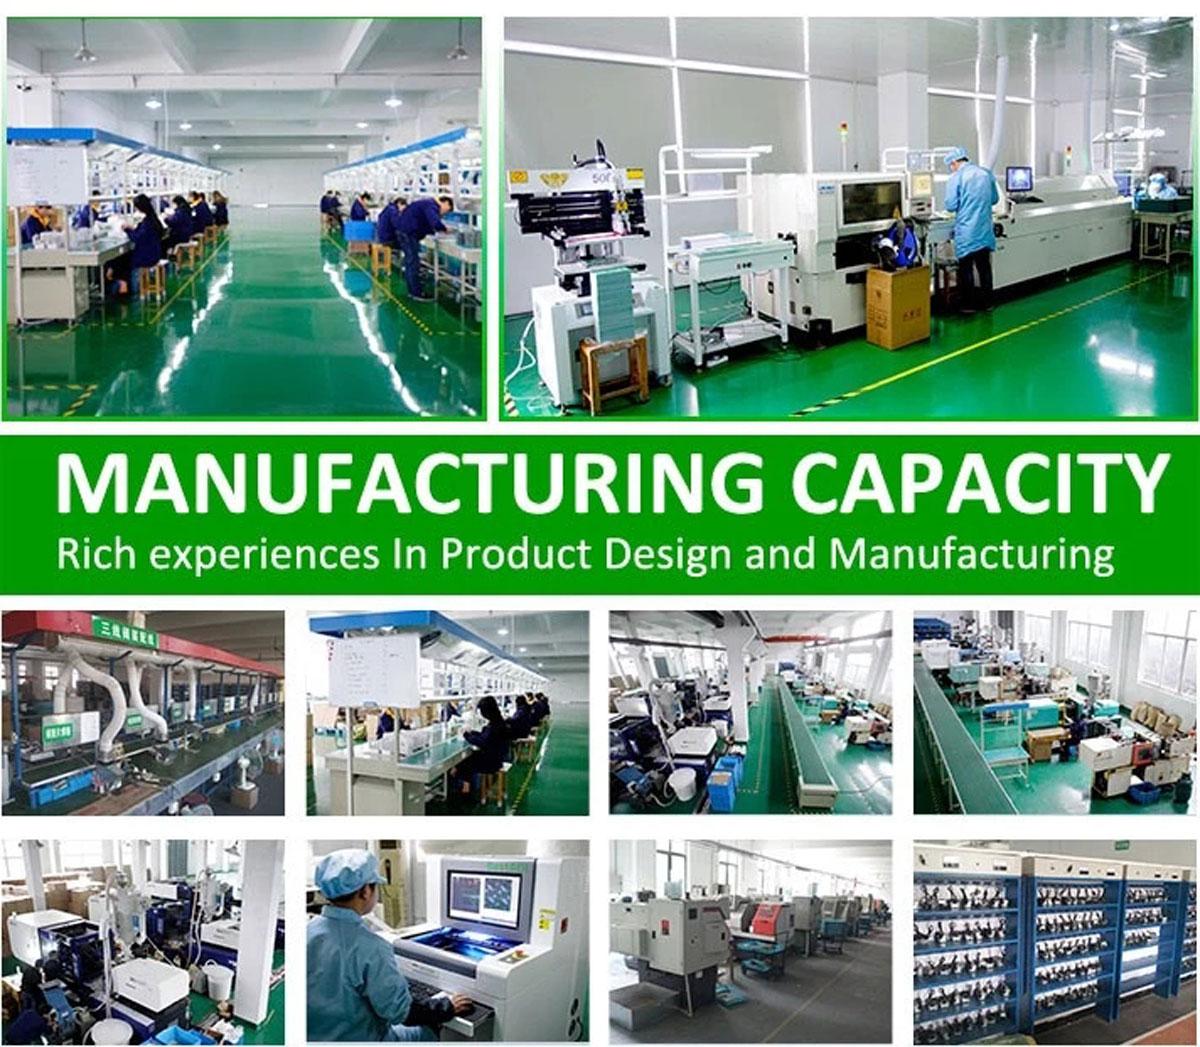 Hotowell-manufacutring-capacity.jpg